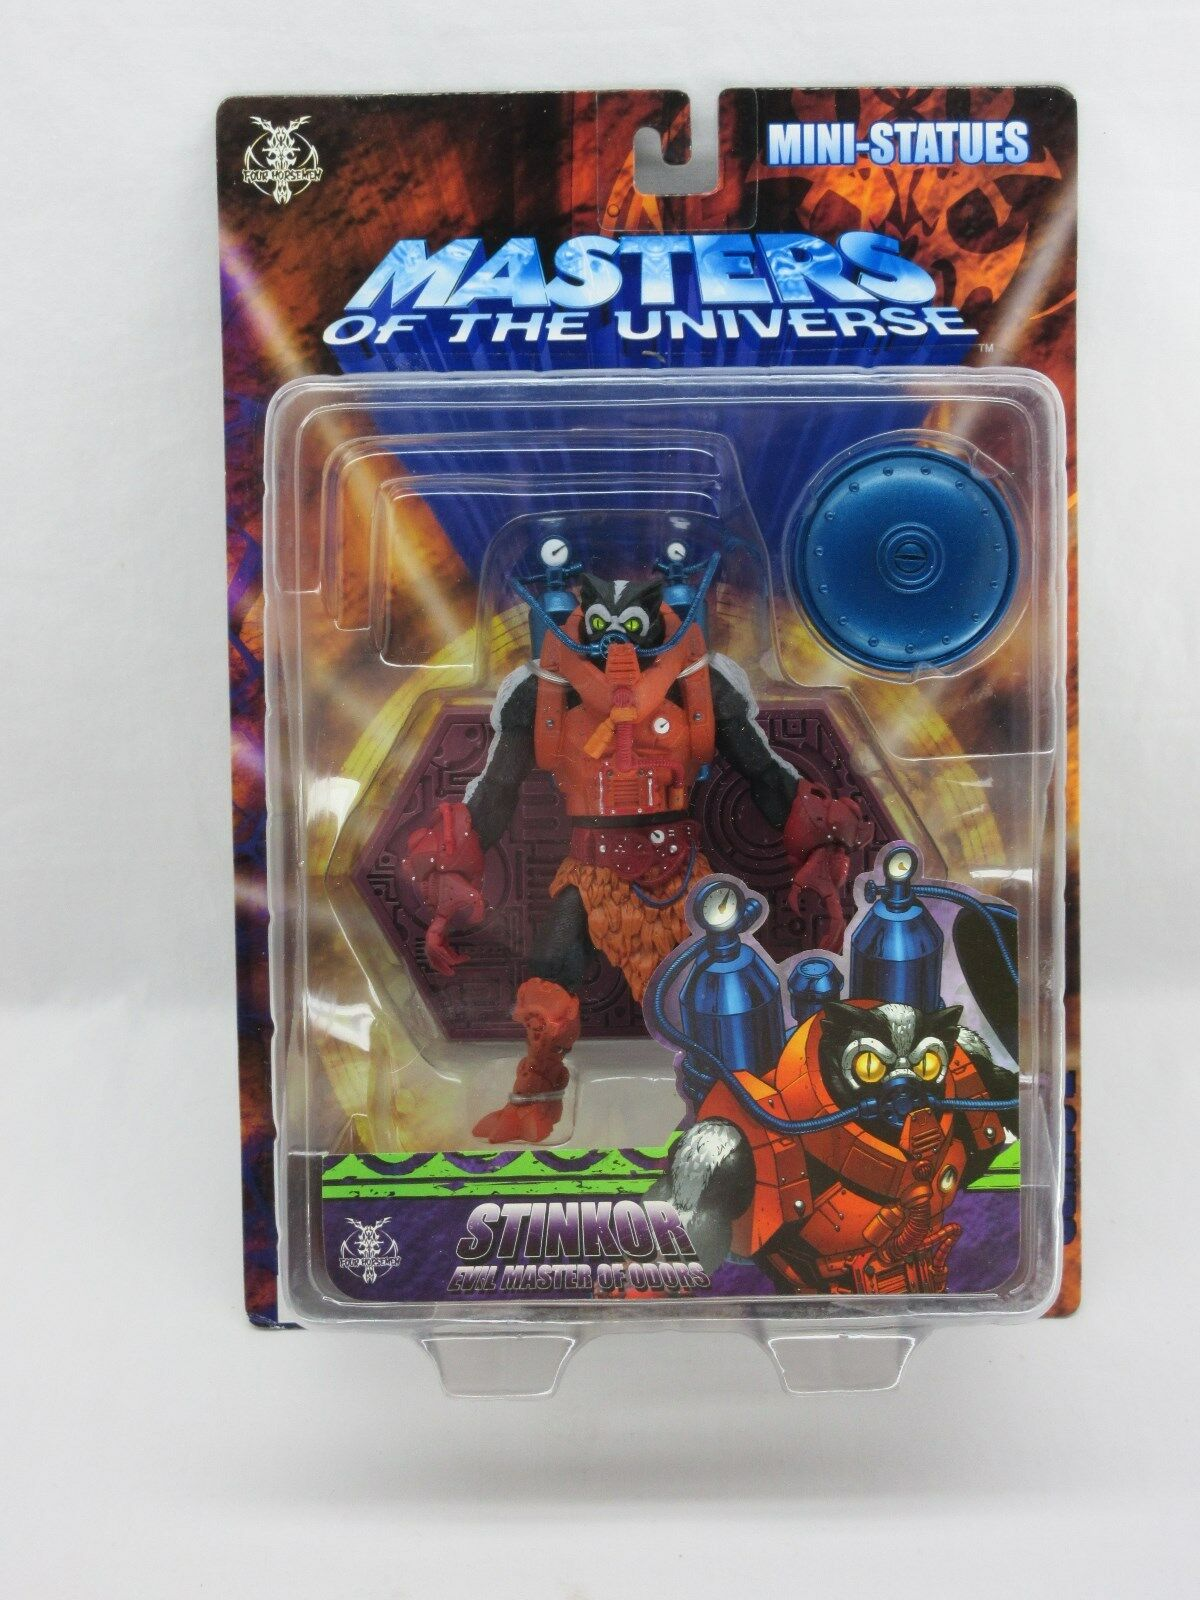 MOTU,STINKOR,200x,Neca statue,MISB,Sealed,Masters of the Universe,He man